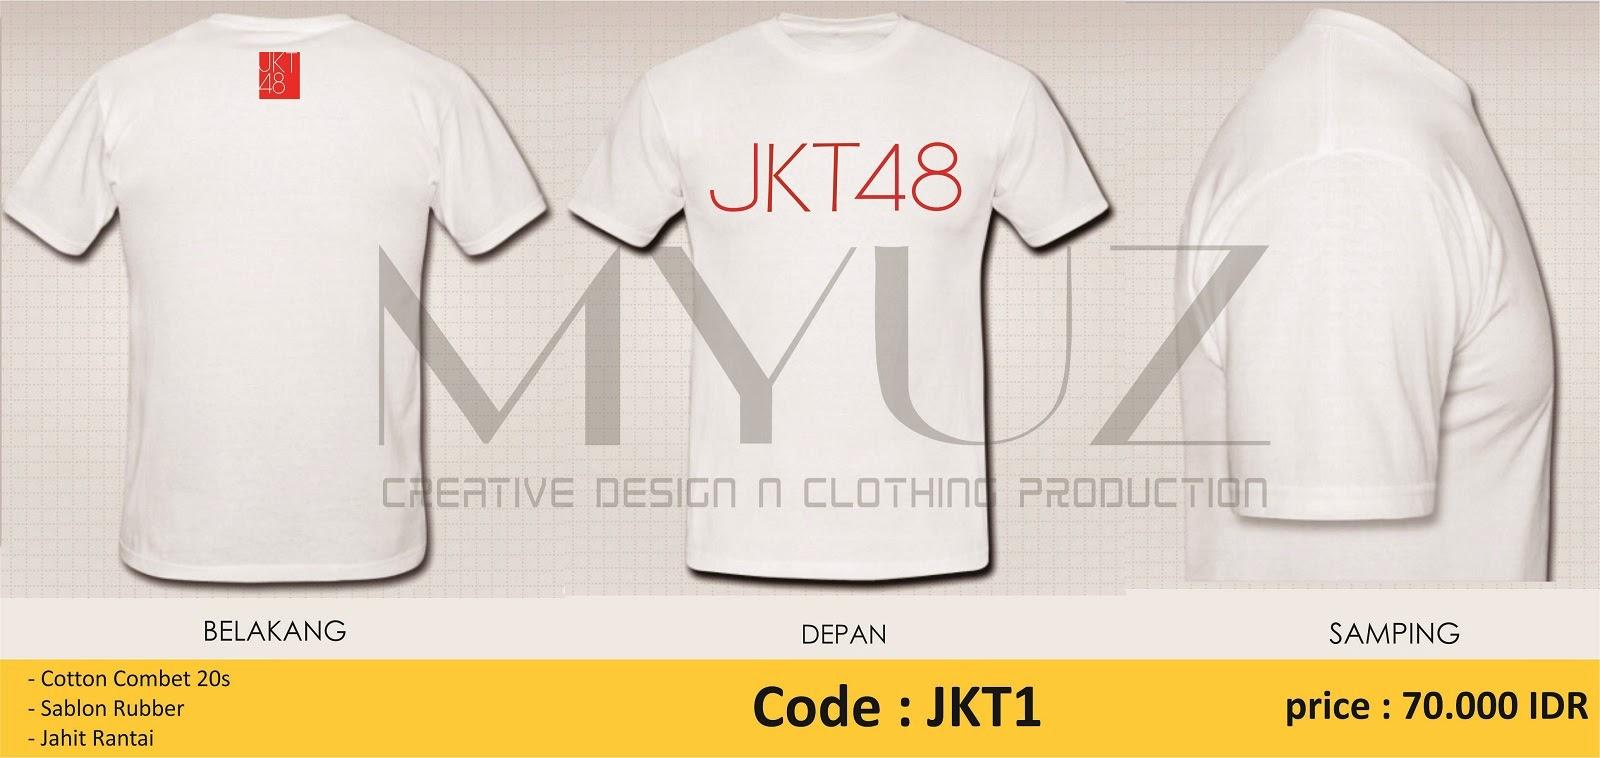 Desain t shirt jkt48 - Kaos Jkt48